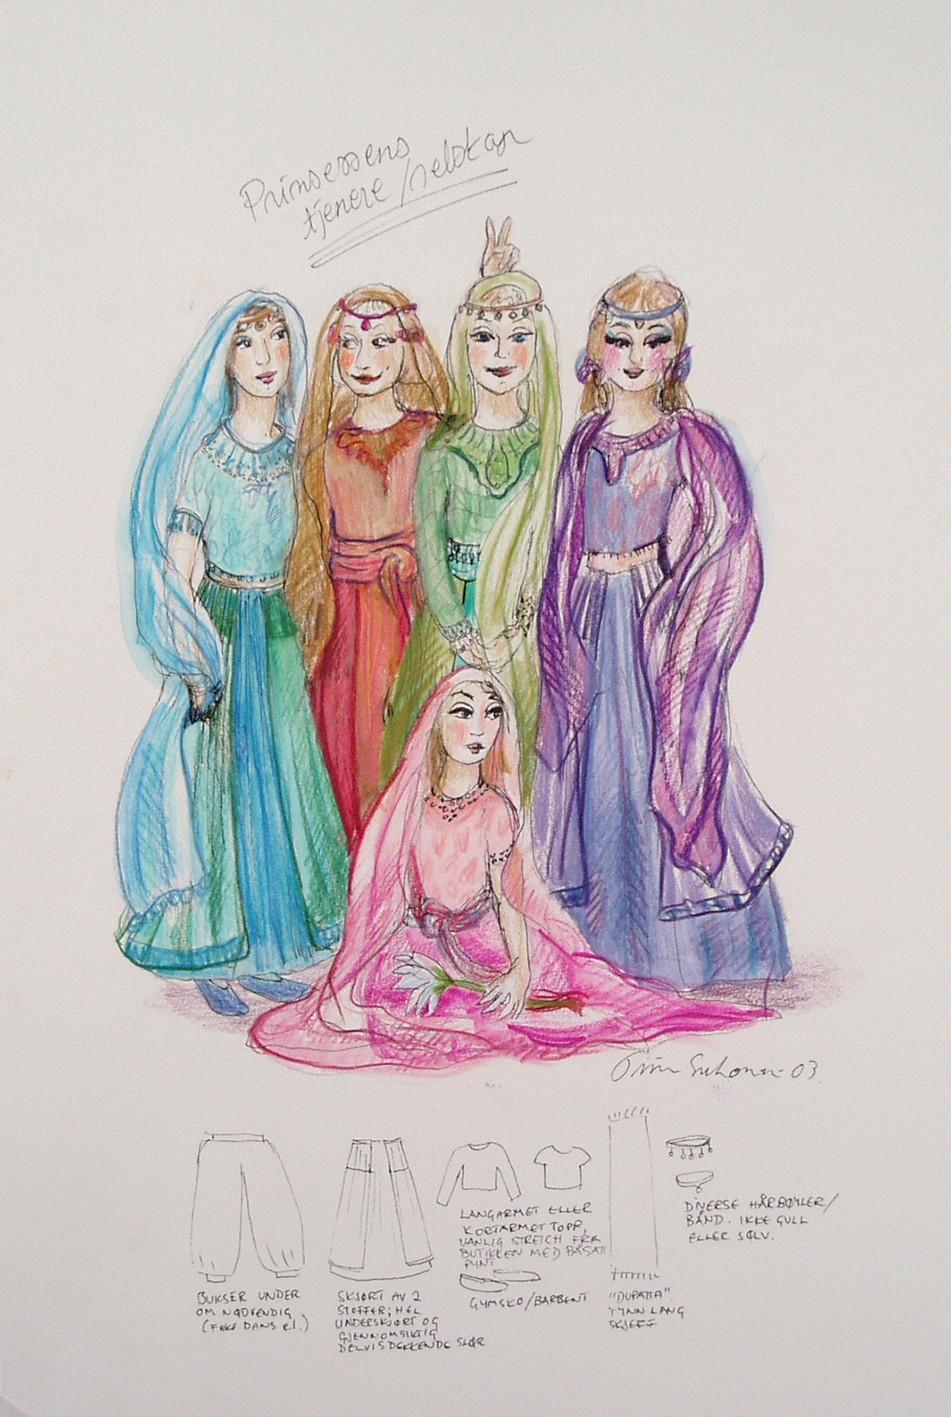 En flerfarget skisse av prinsessens tjenere i Bagdad